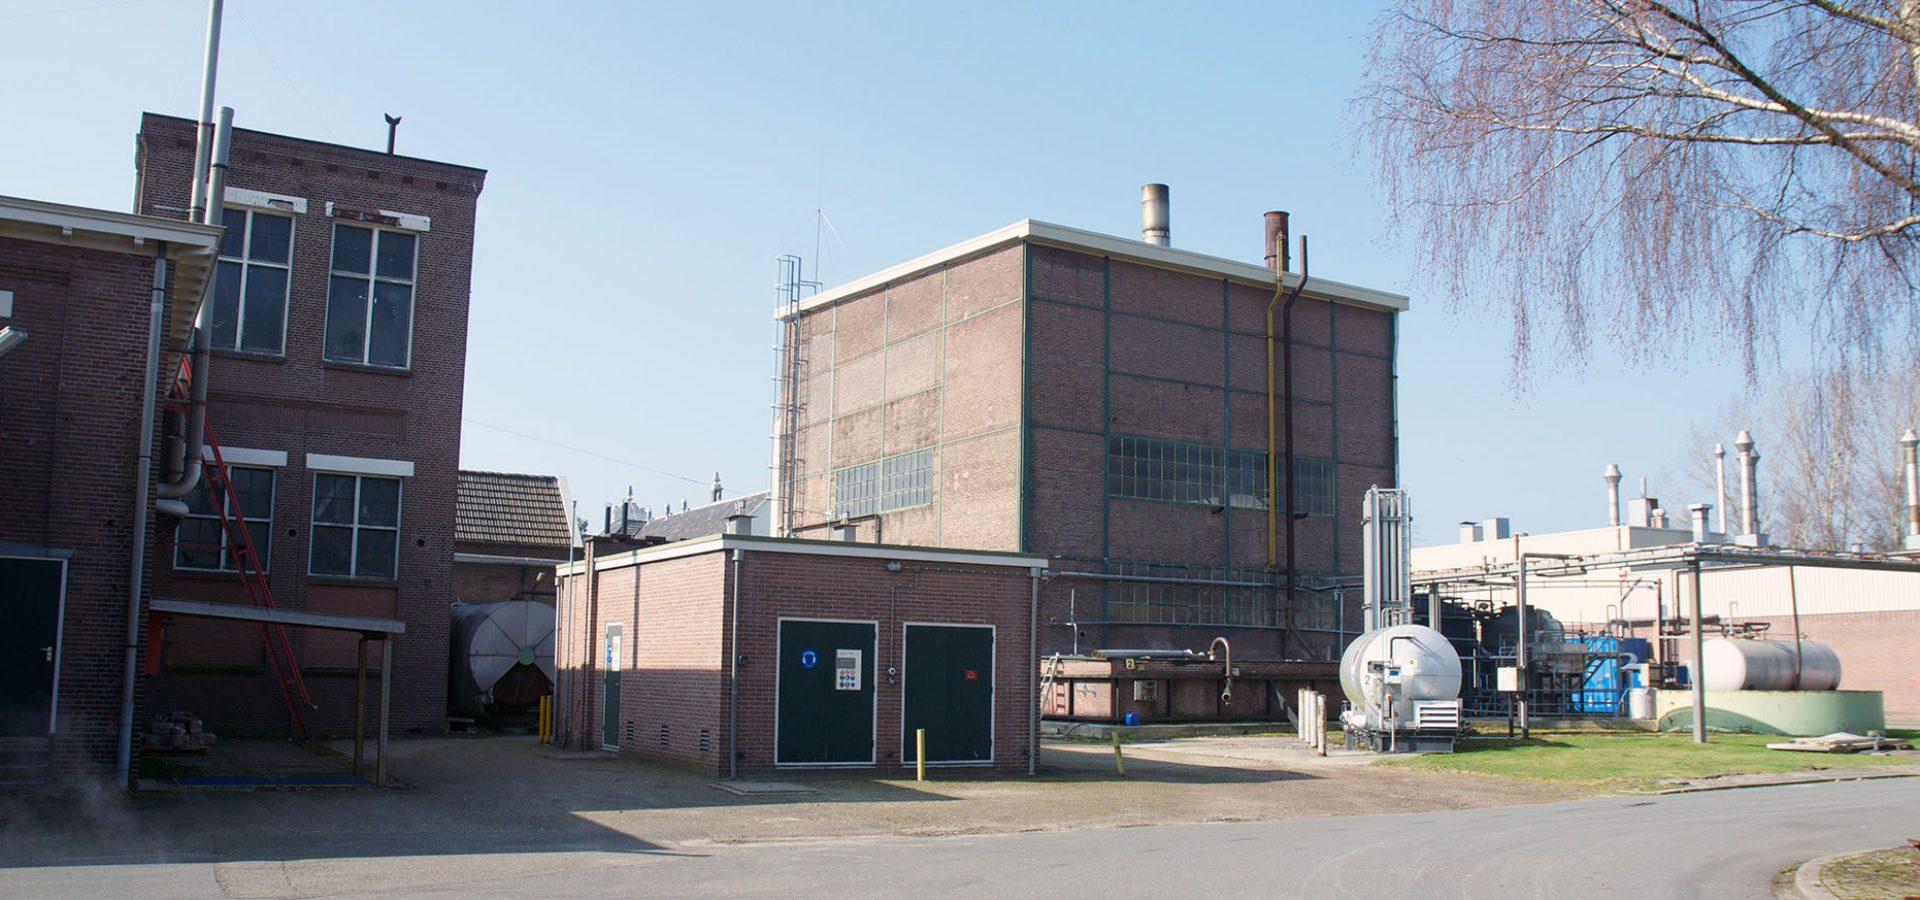 FARO architecten Reggesteyn aan de Regge Nijverdal 02